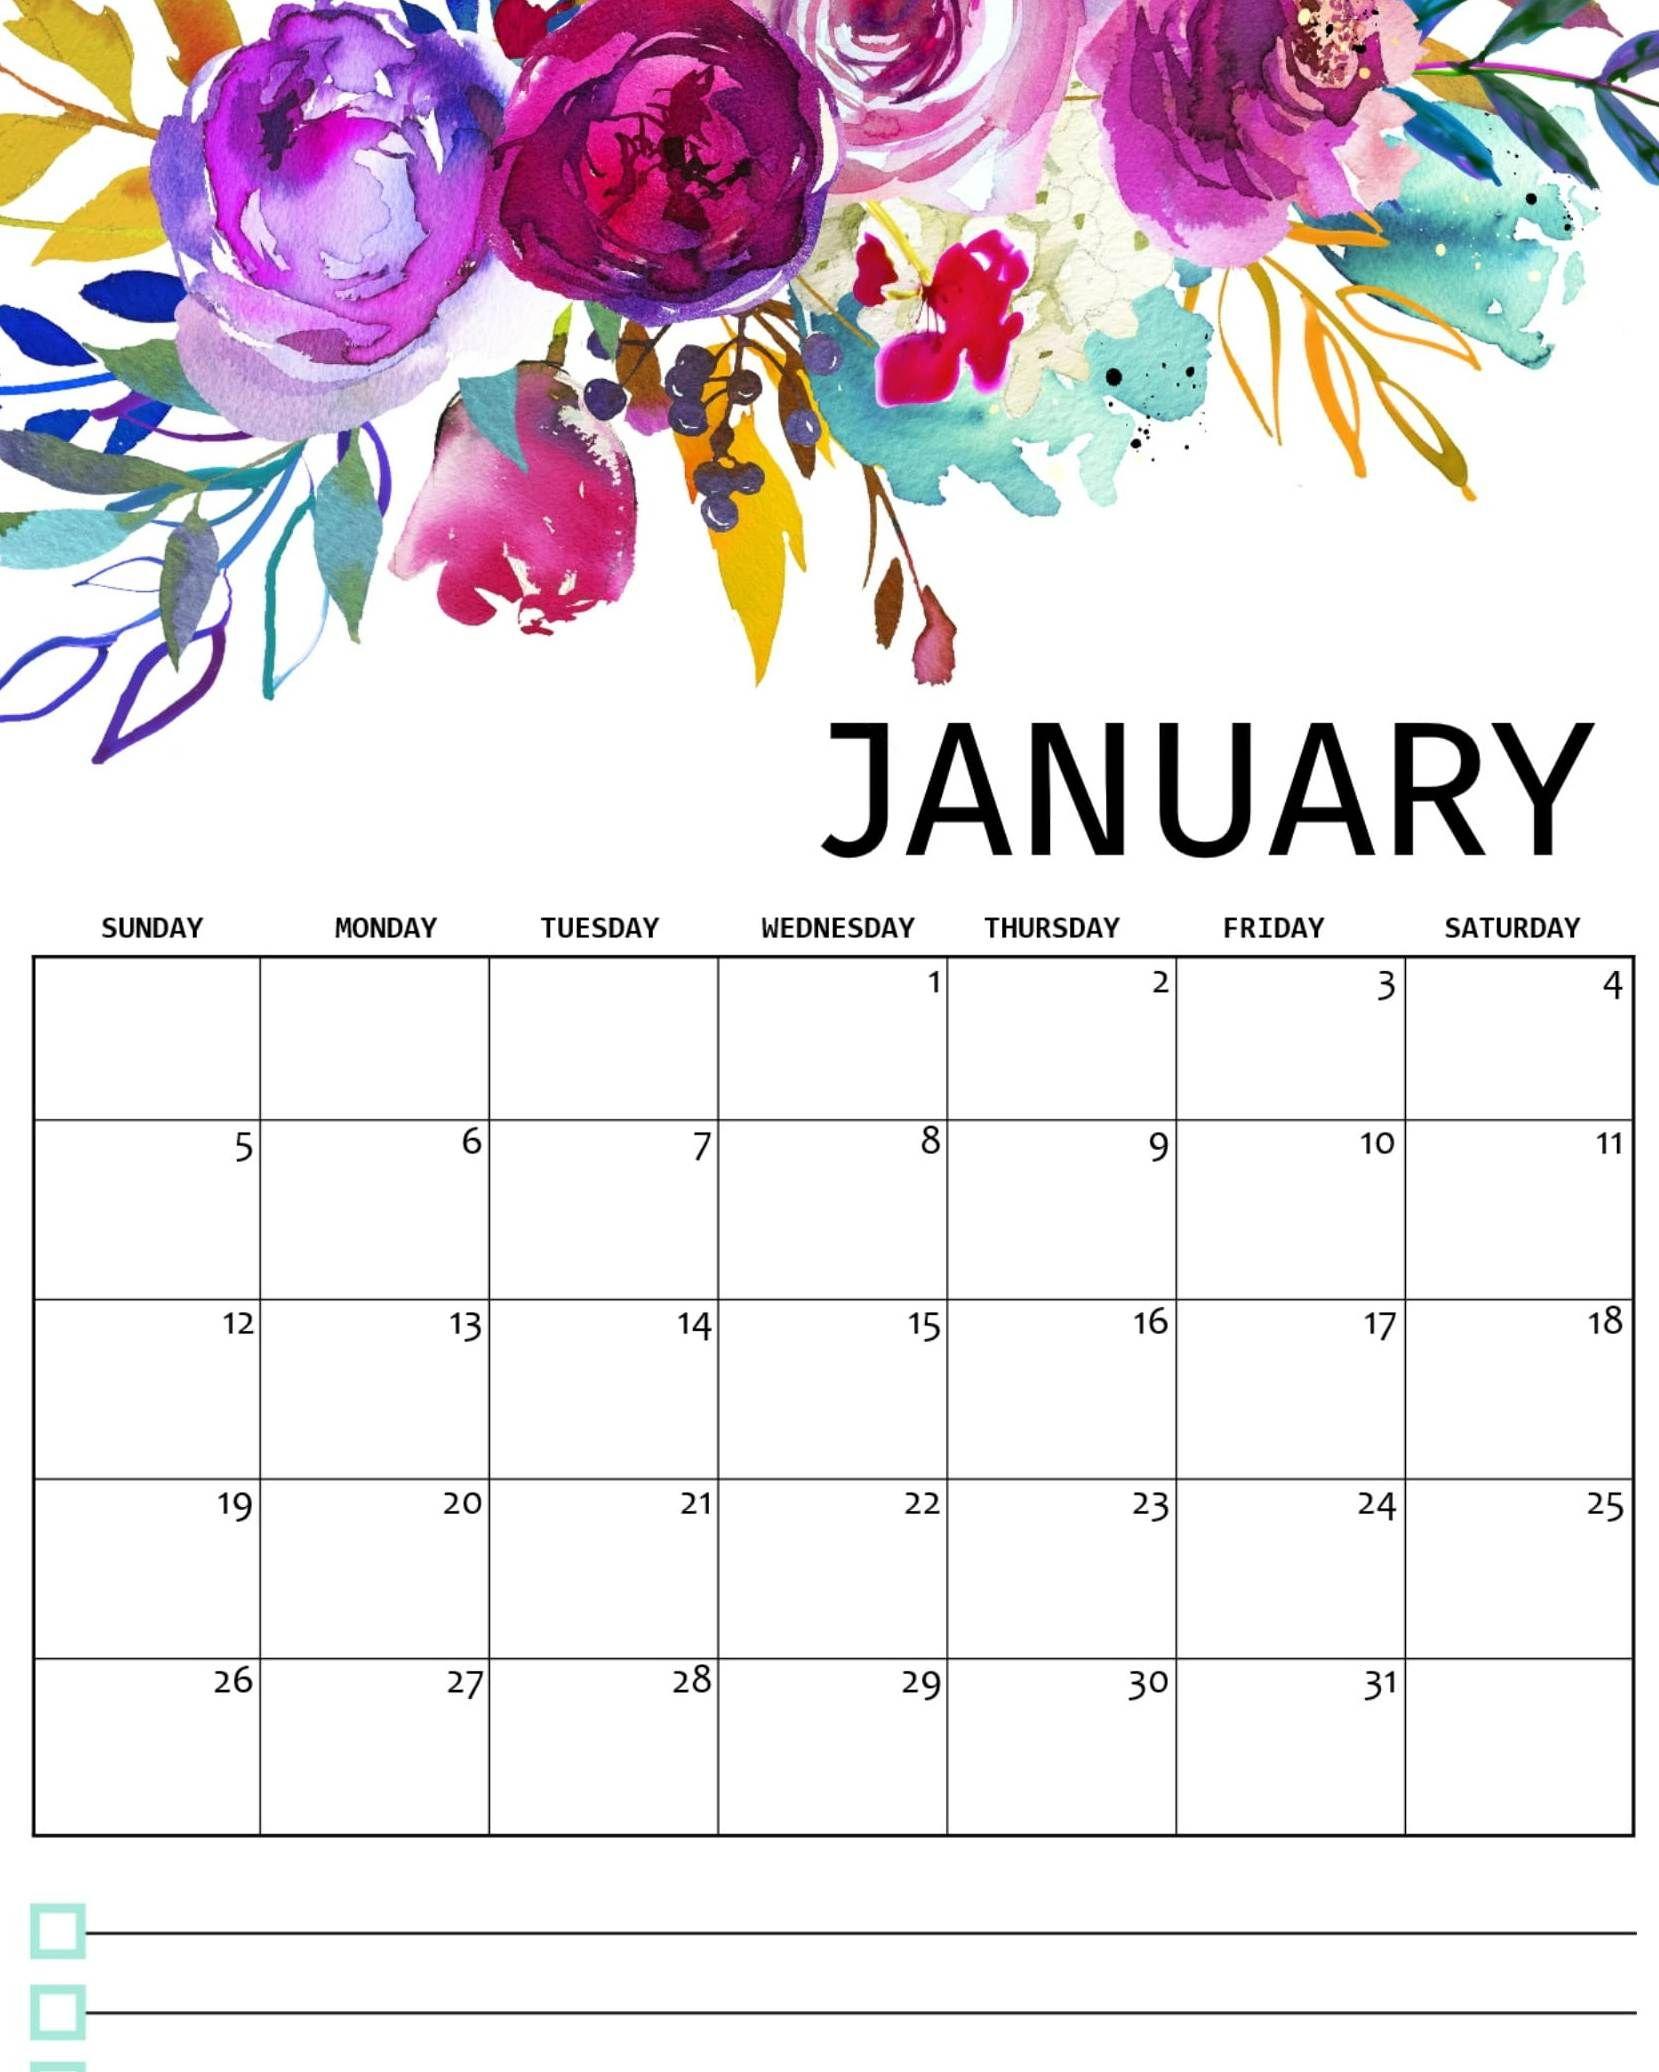 January 2020 Calendar Canada With Holidays | Календарь